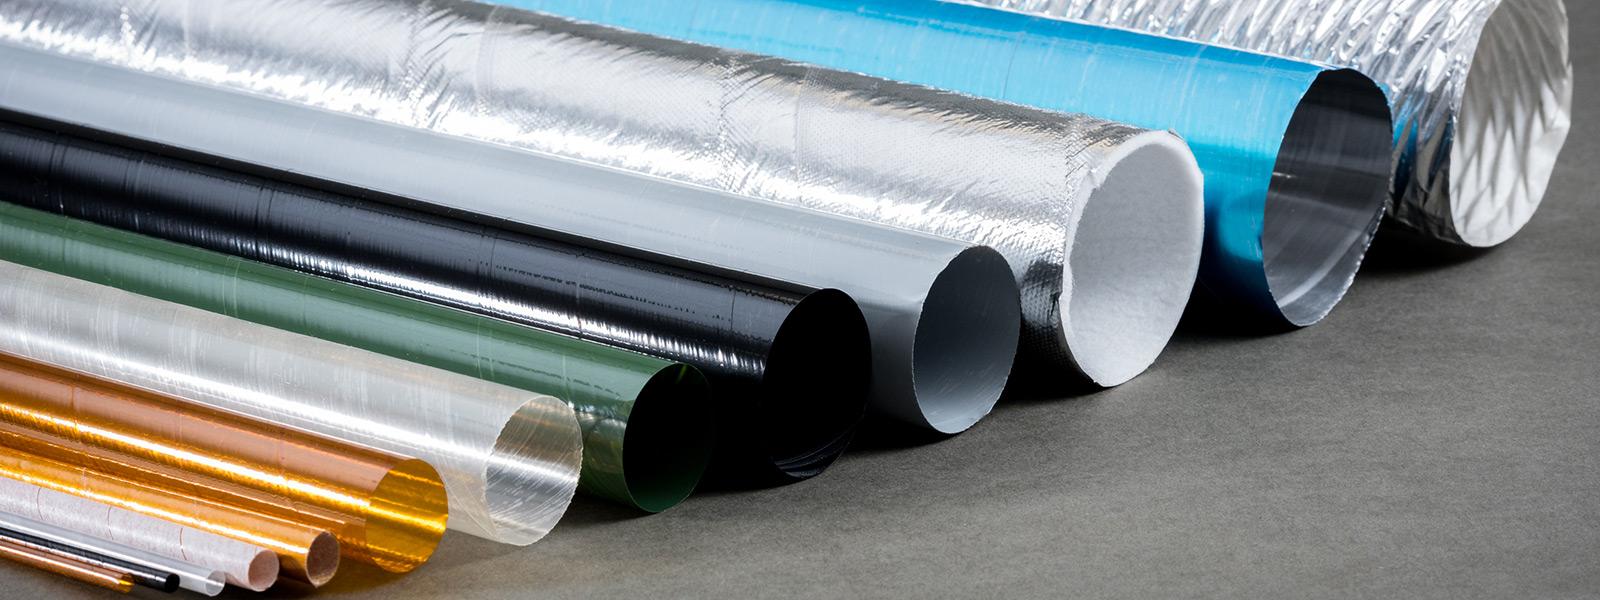 battery insulation materials